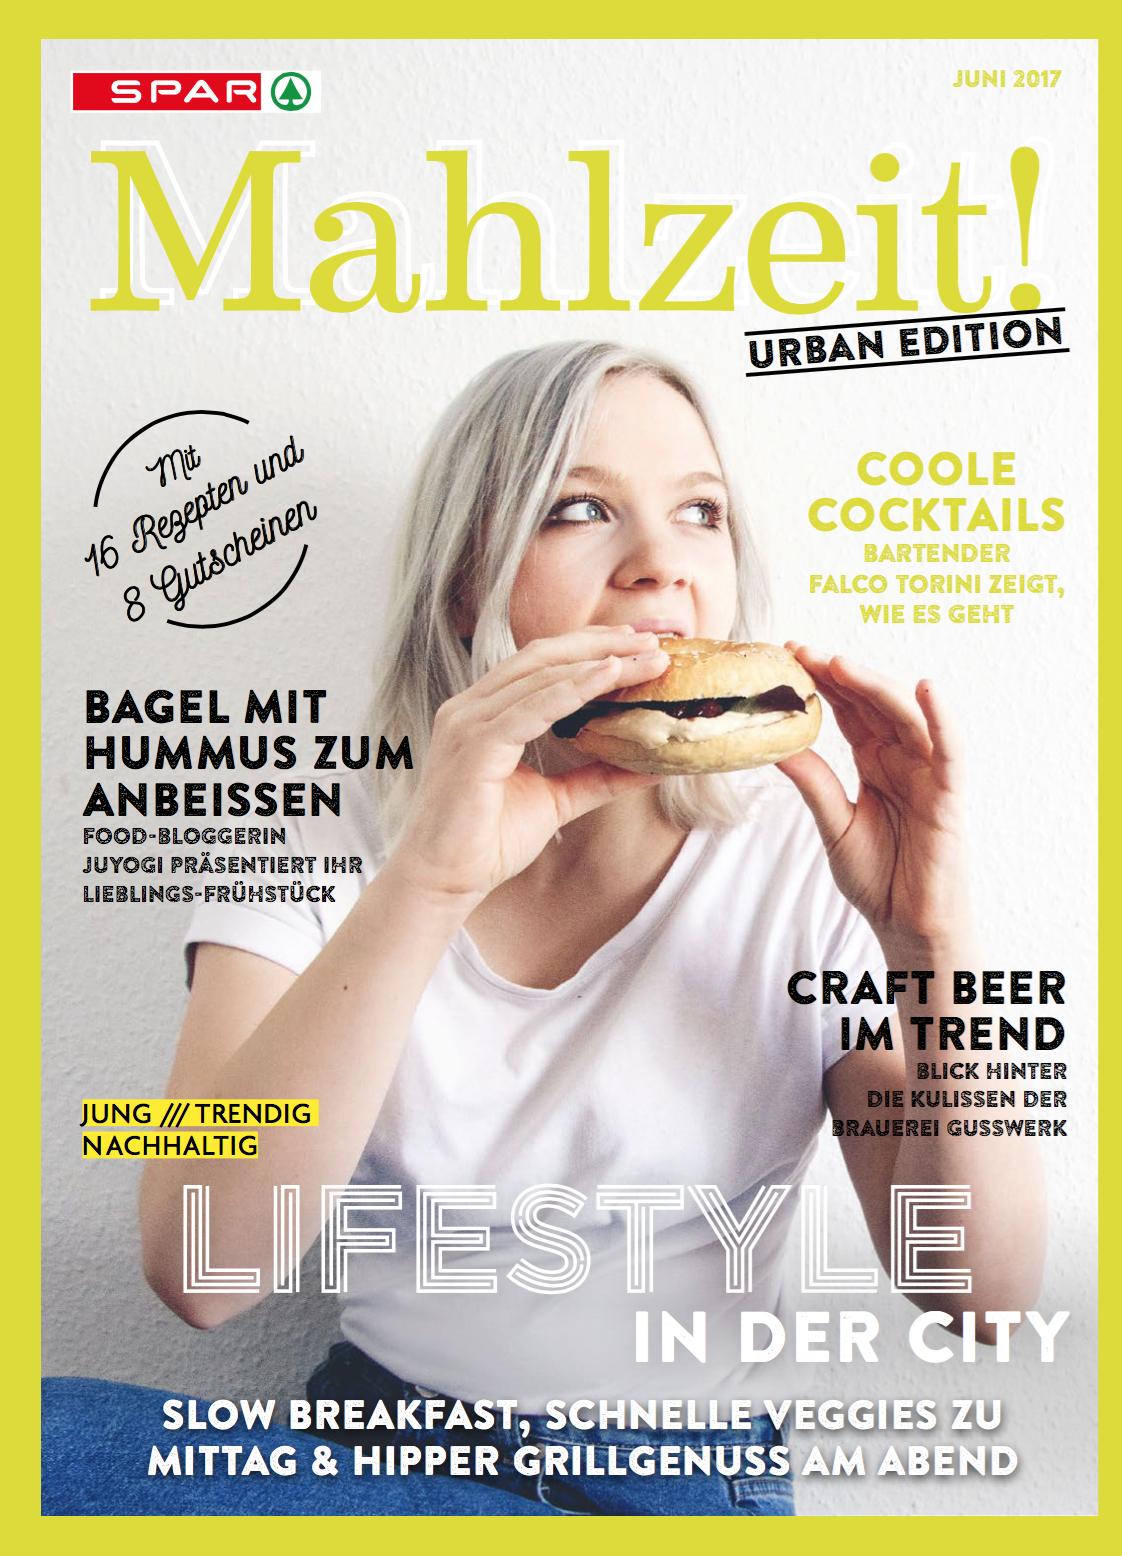 NUSSYY® im SPAR MAHLZEIT! MAGAZIN - COVER URBAN EDITION